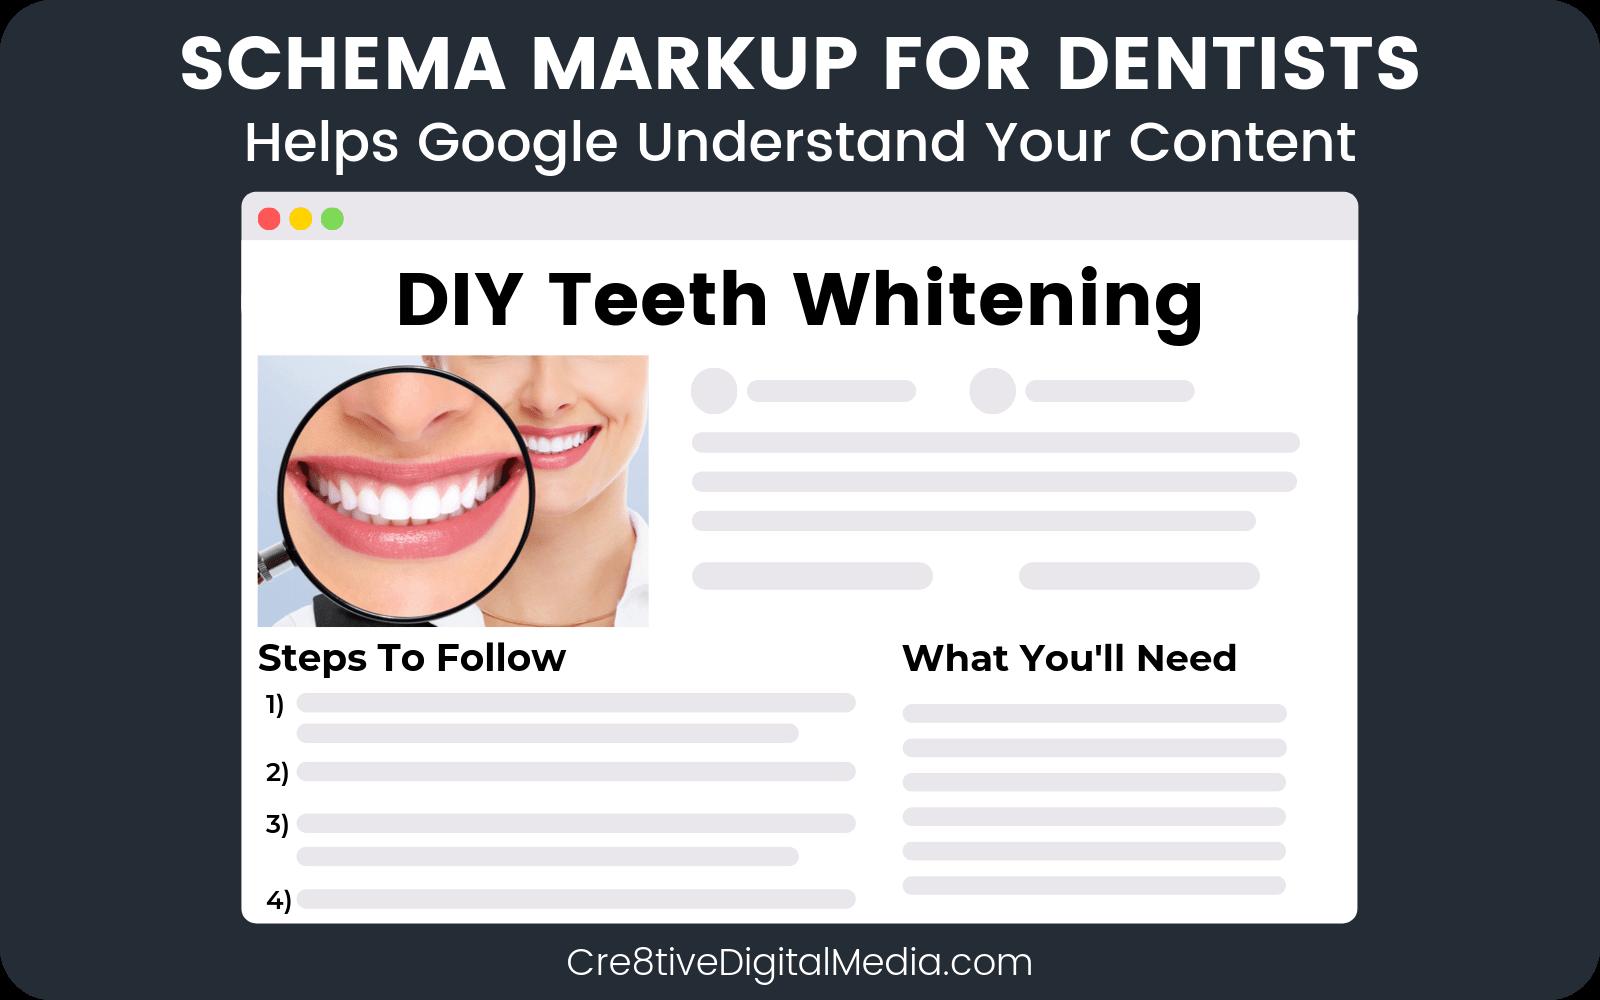 Blog Post: DIY Teeth Whitening